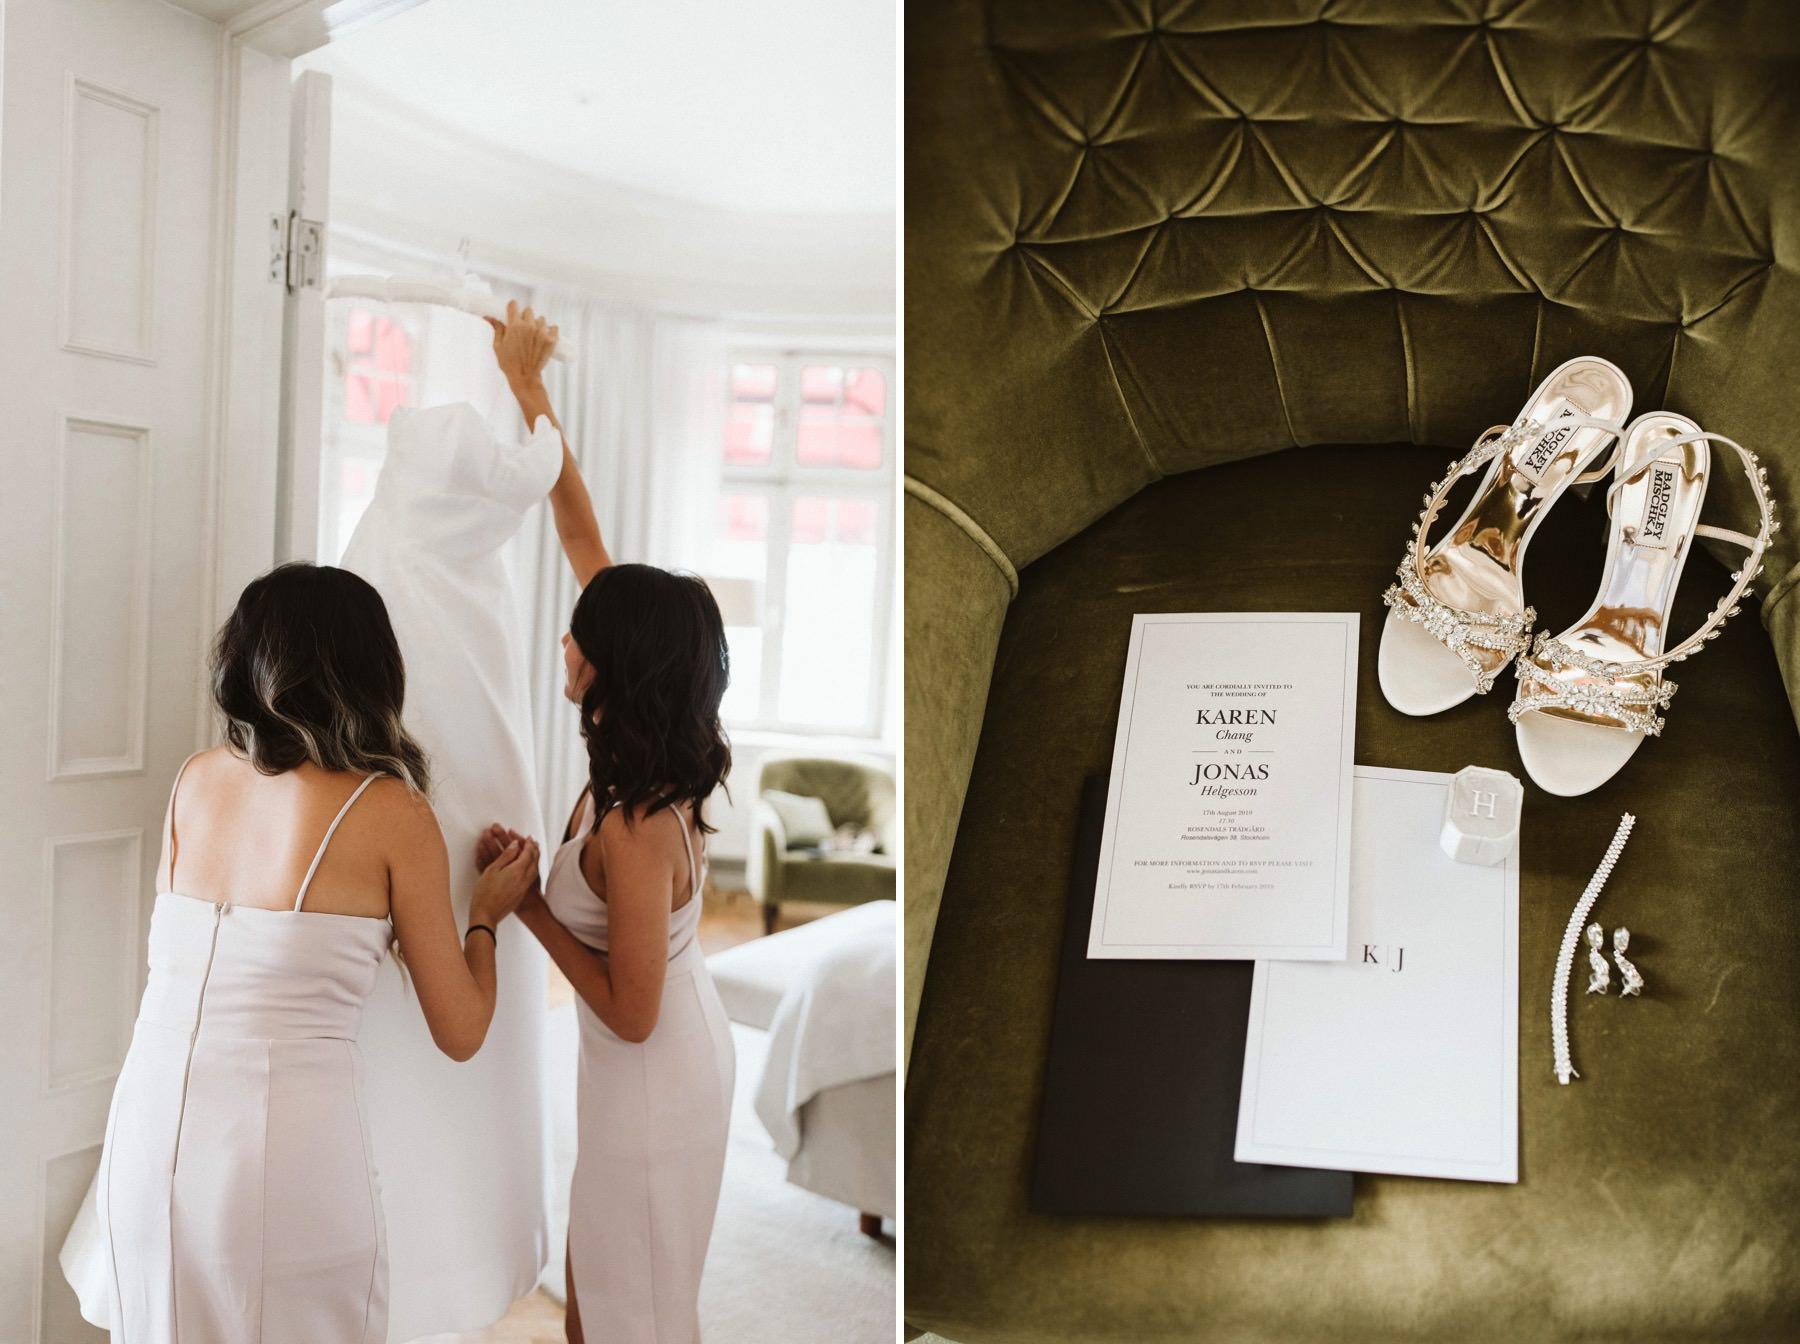 Hotel Diplomat Stockholm wedding